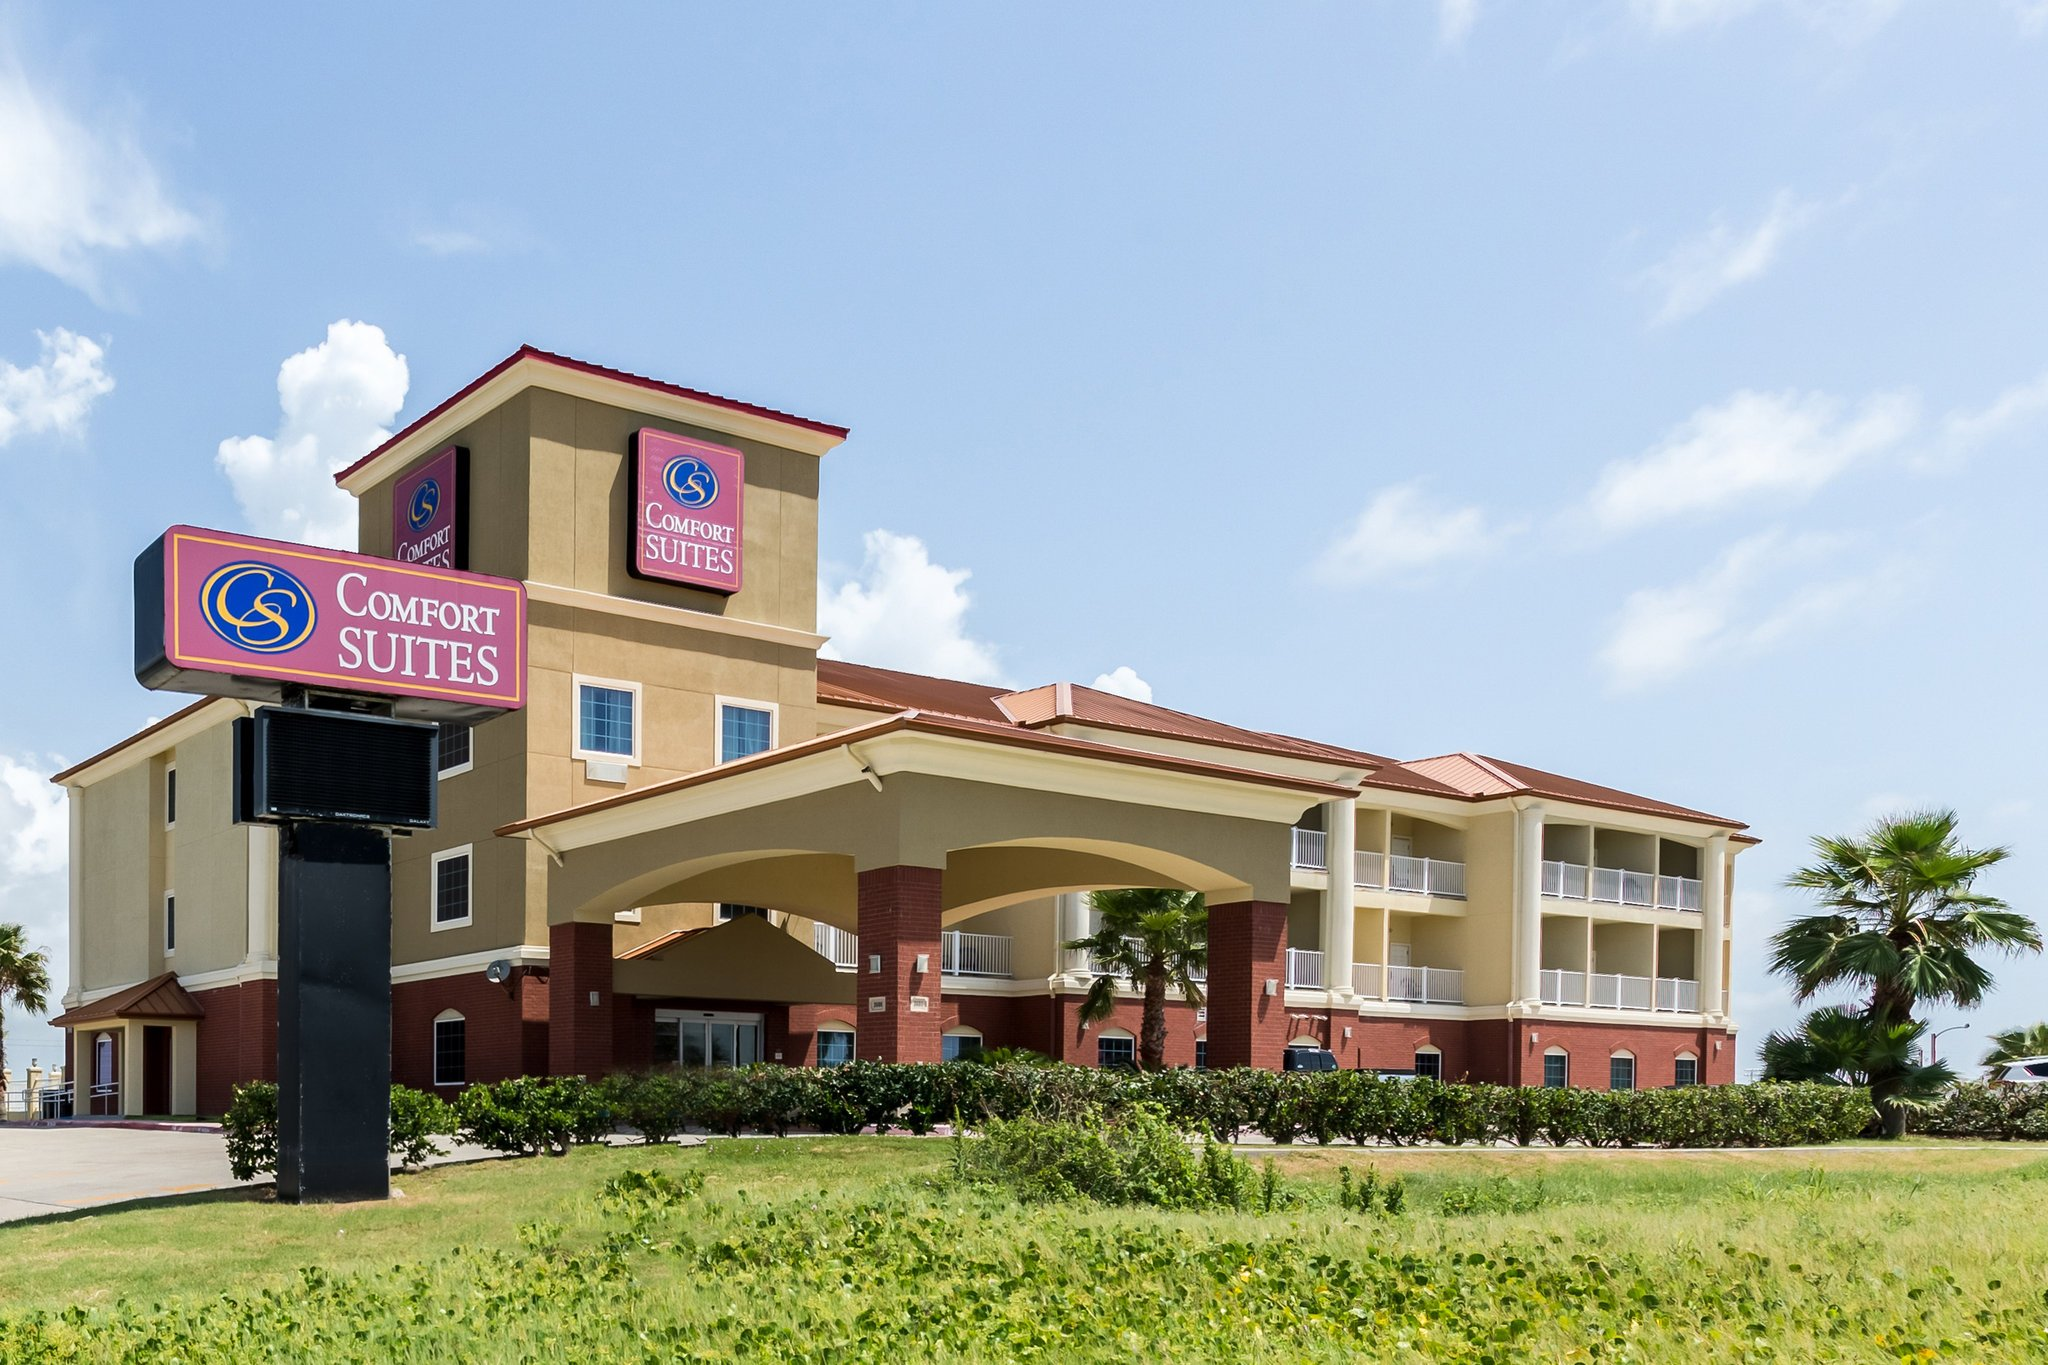 Comfort Suites Galveston Updated 2017 Hotel Reviews